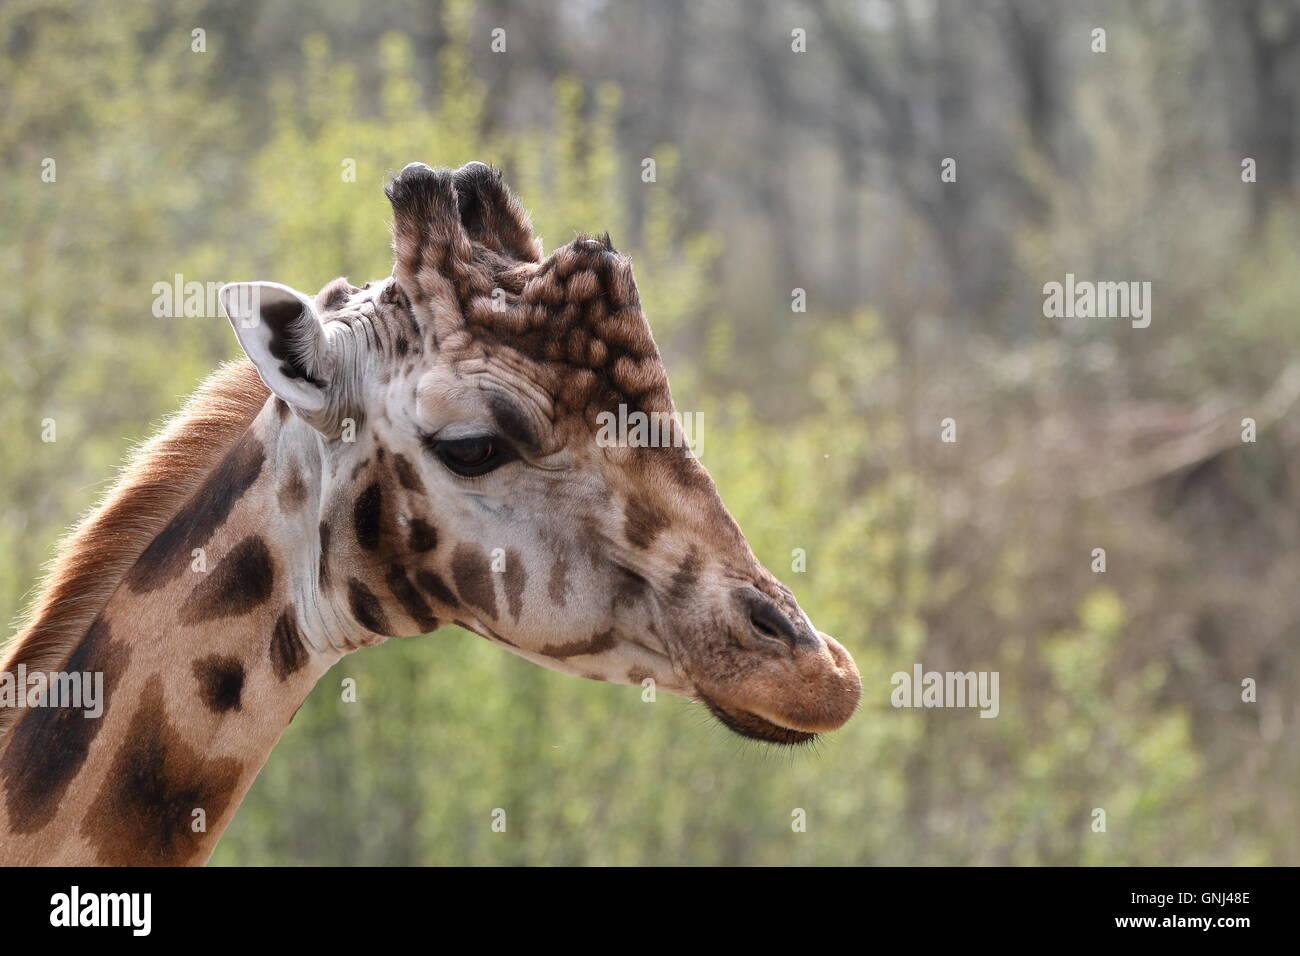 Une photo de la tête d'un jeune mâle Girafe (Giraffa camelopardalis) vu de côté, avec un Photo Stock